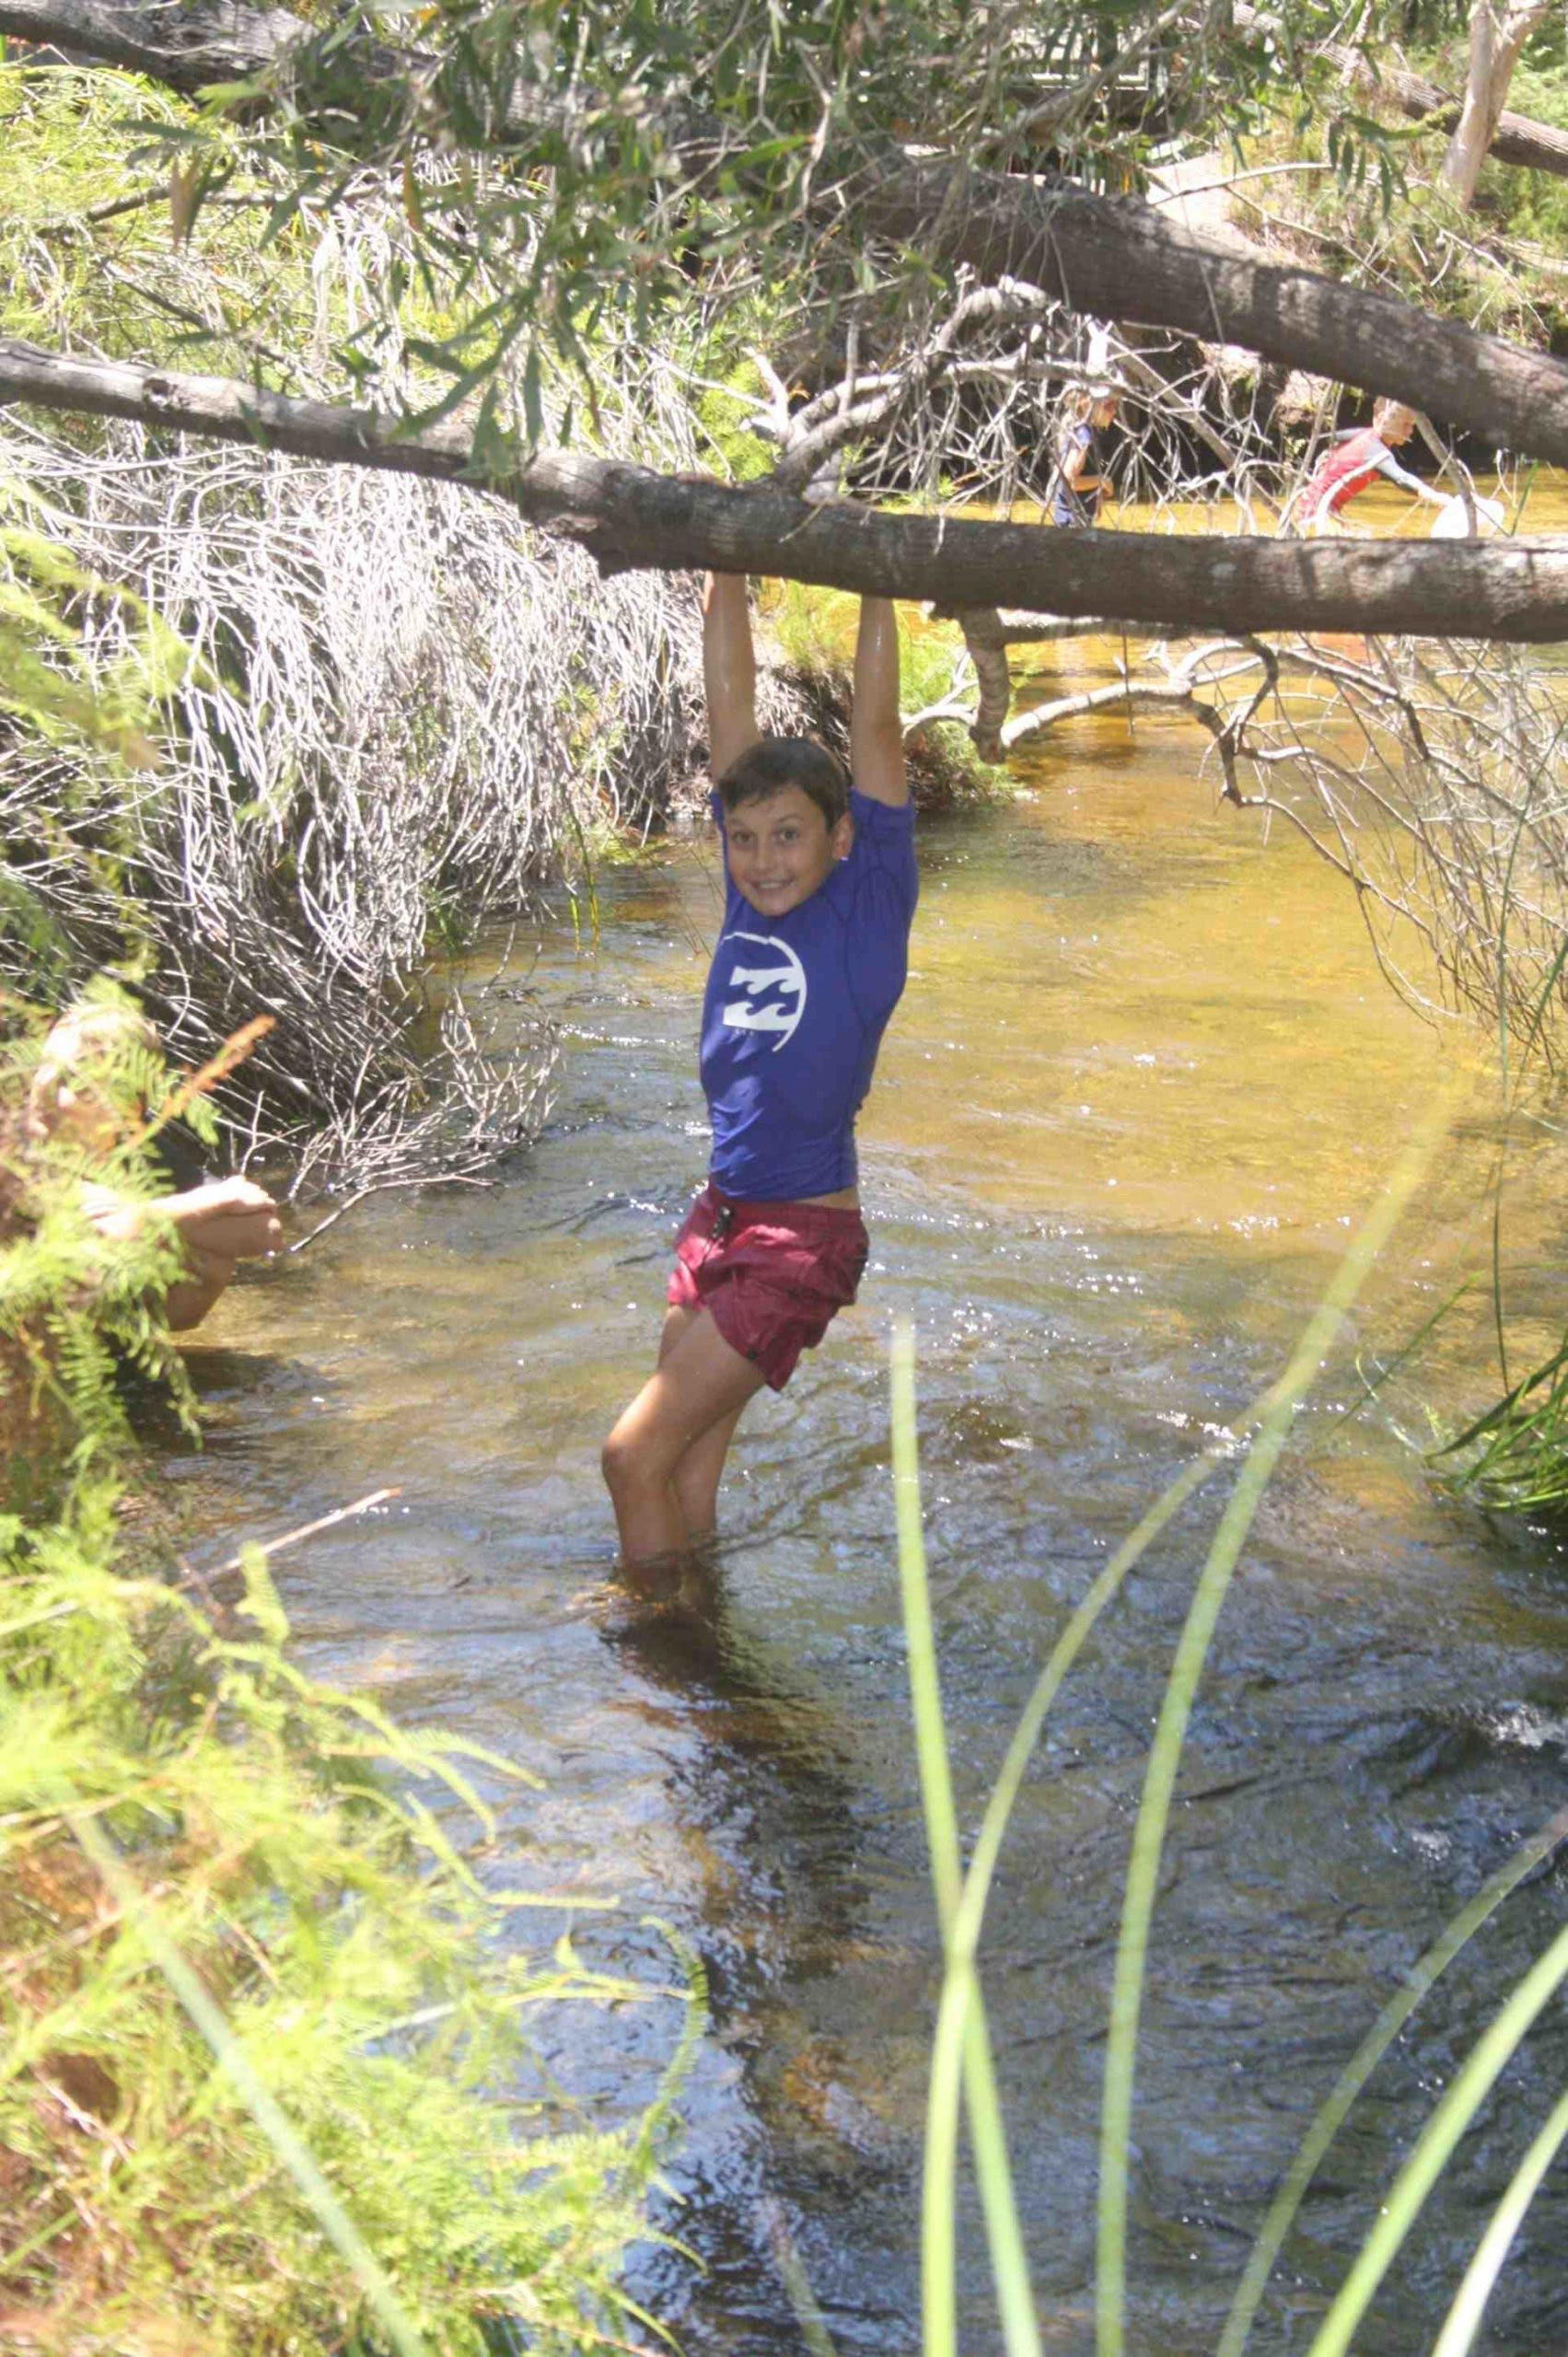 3. Seary's Creek